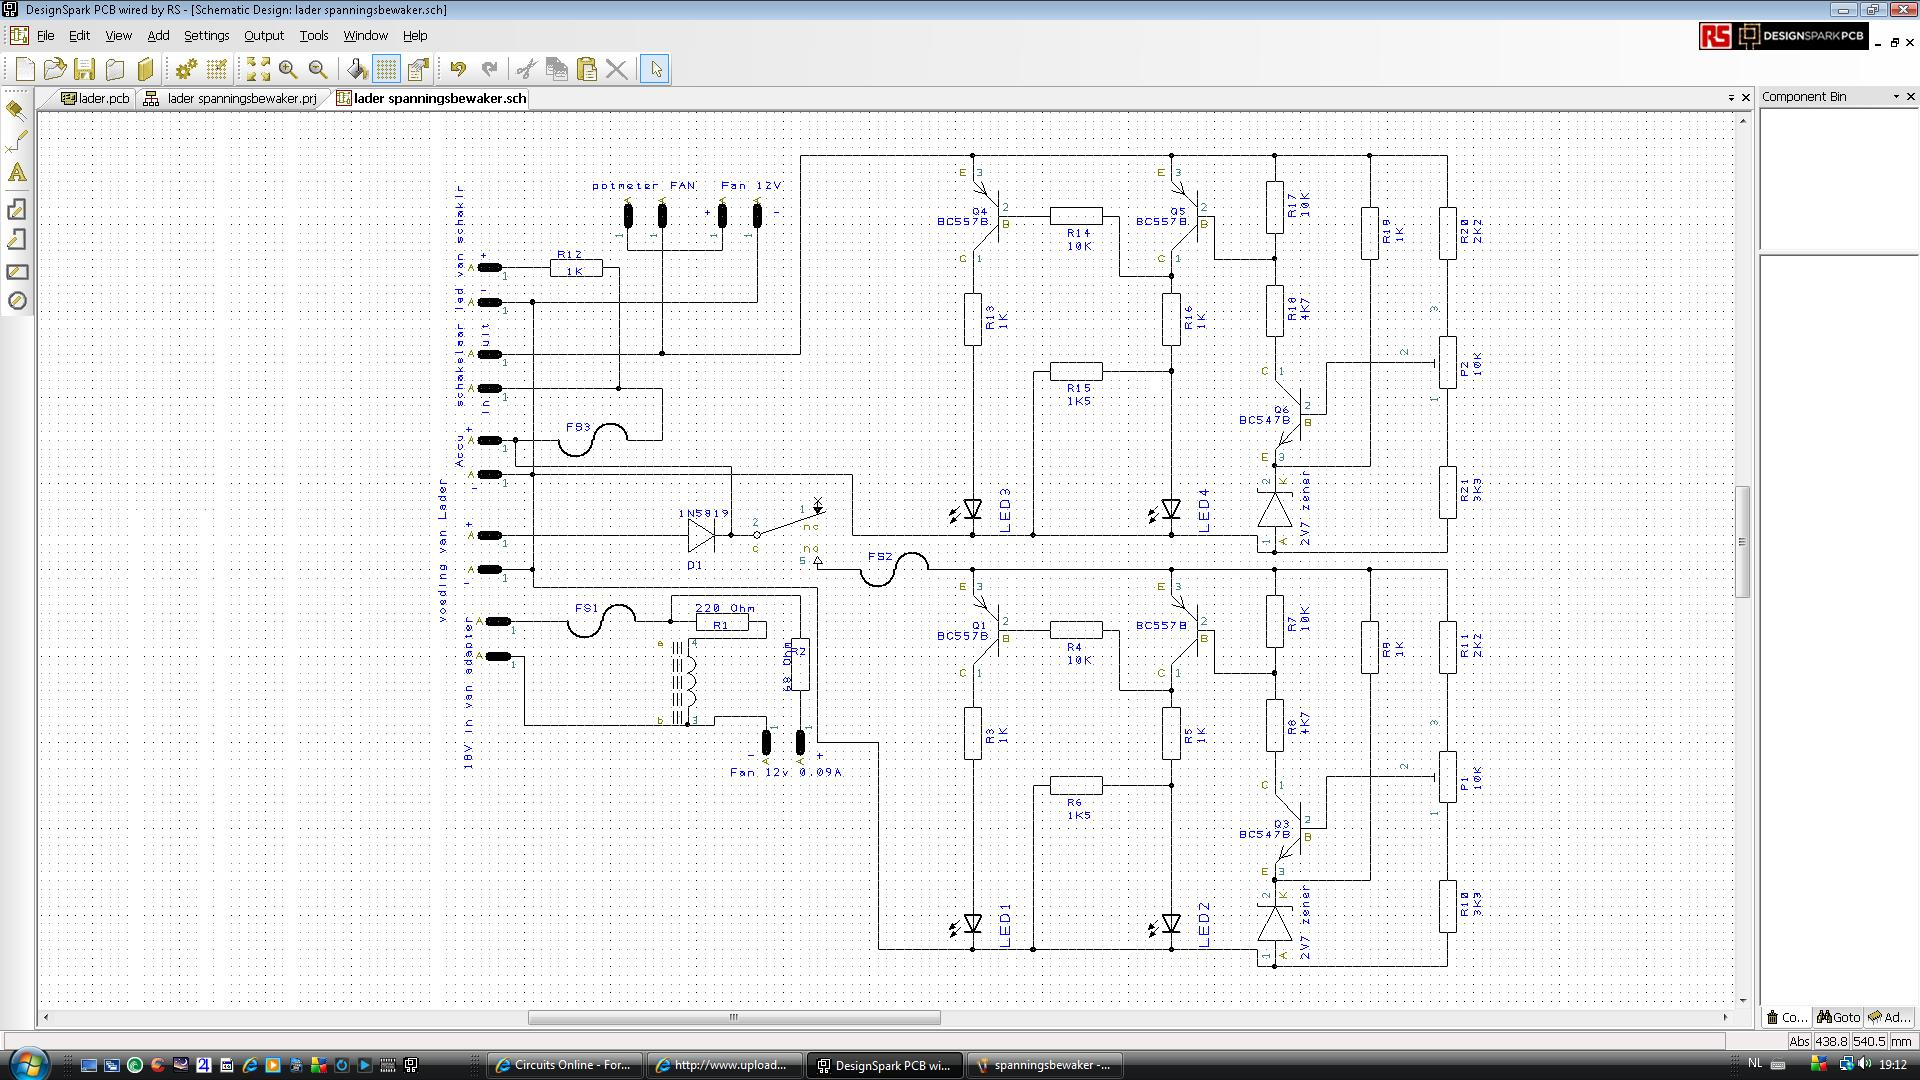 Spanning Onderbreken Forum Circuits Online Led Circuit Calculator Http Wwwcircuitsonlinenet Download 48